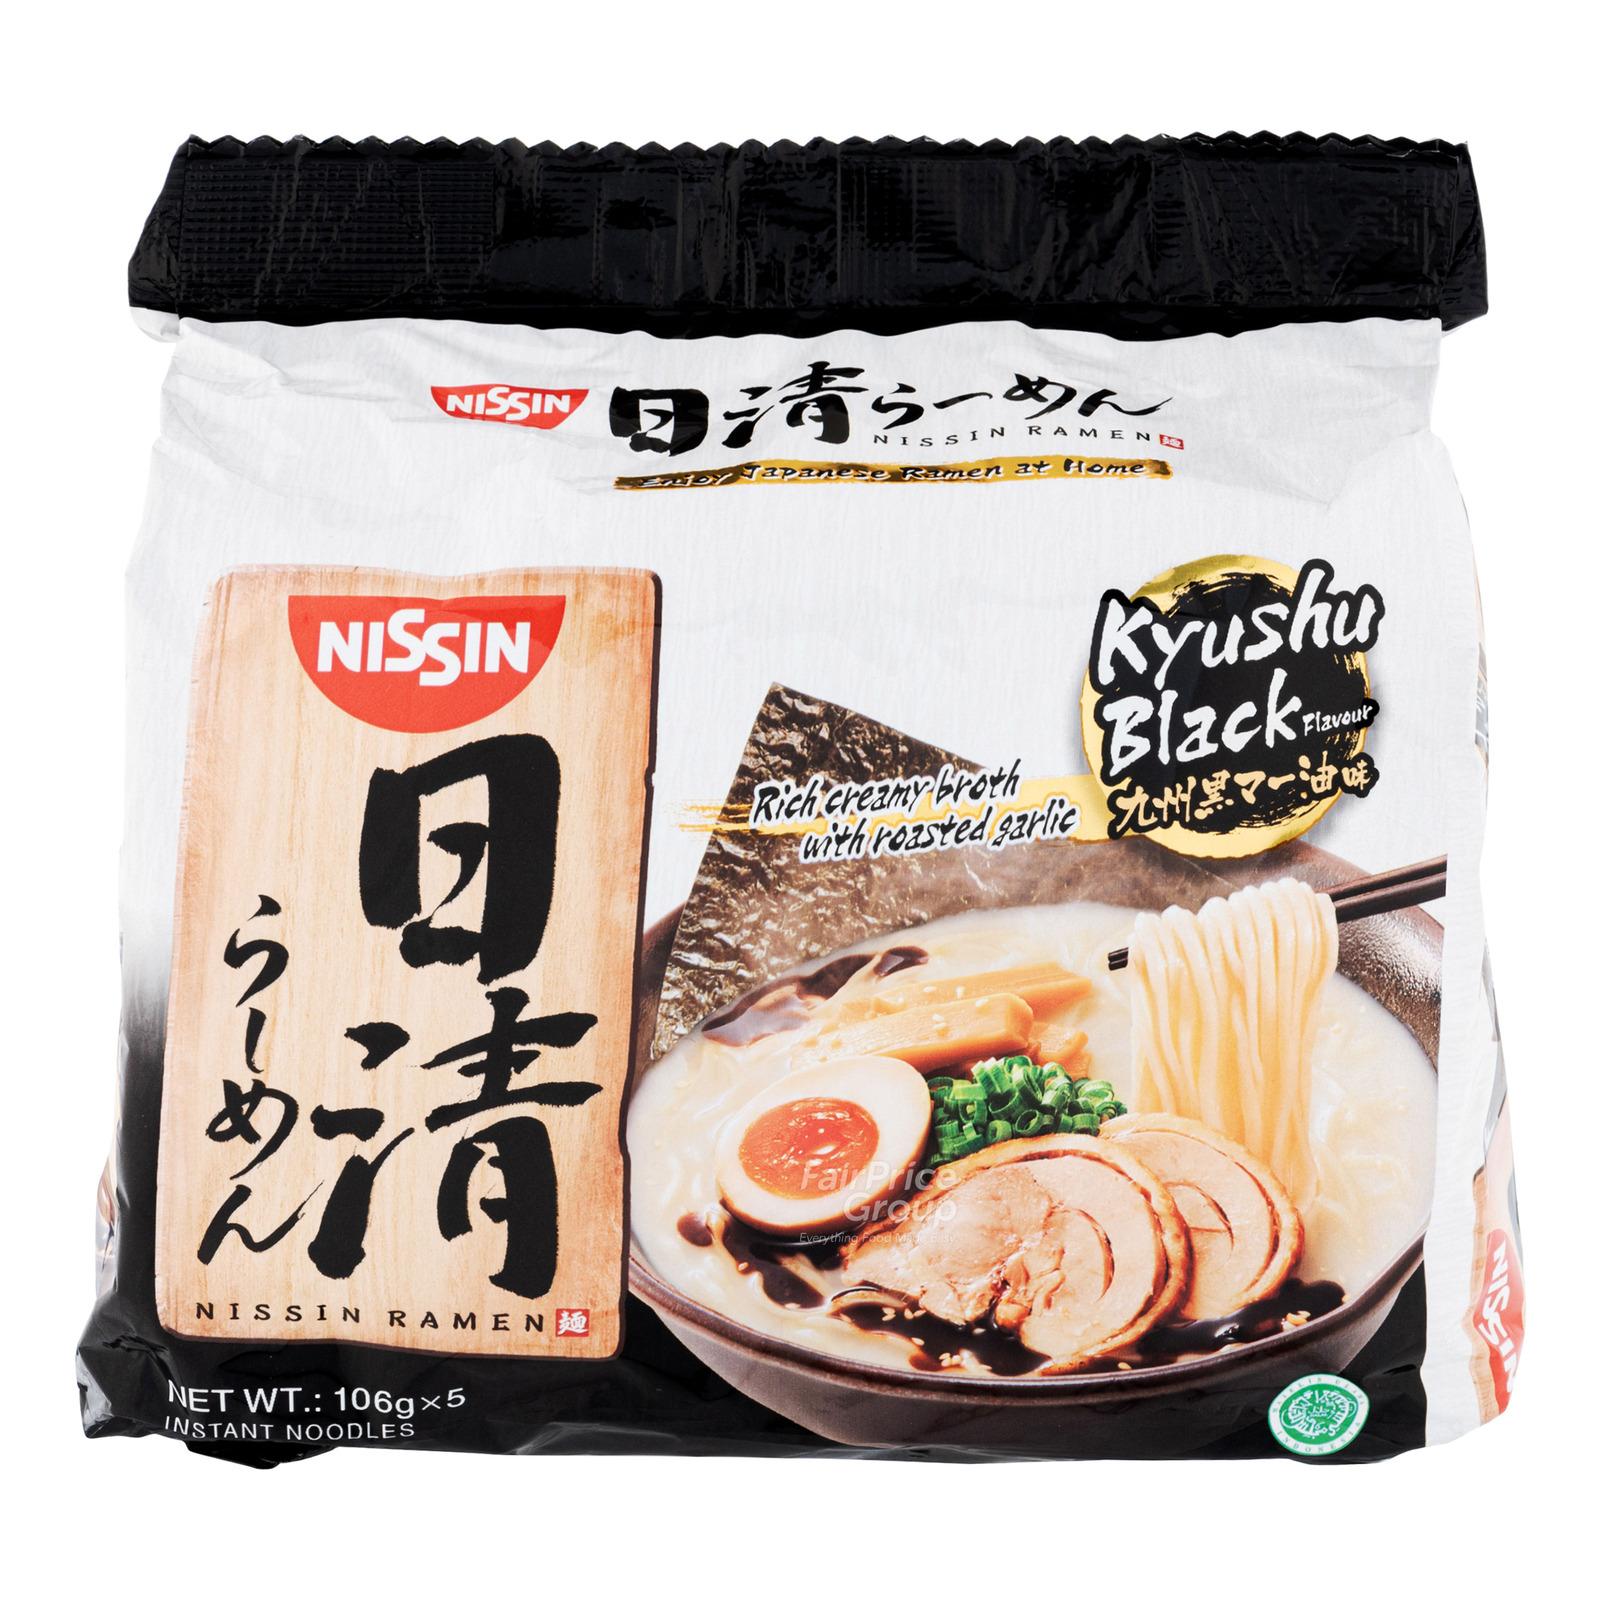 Nissin Instant Japanese Ramen - Kyushu Black